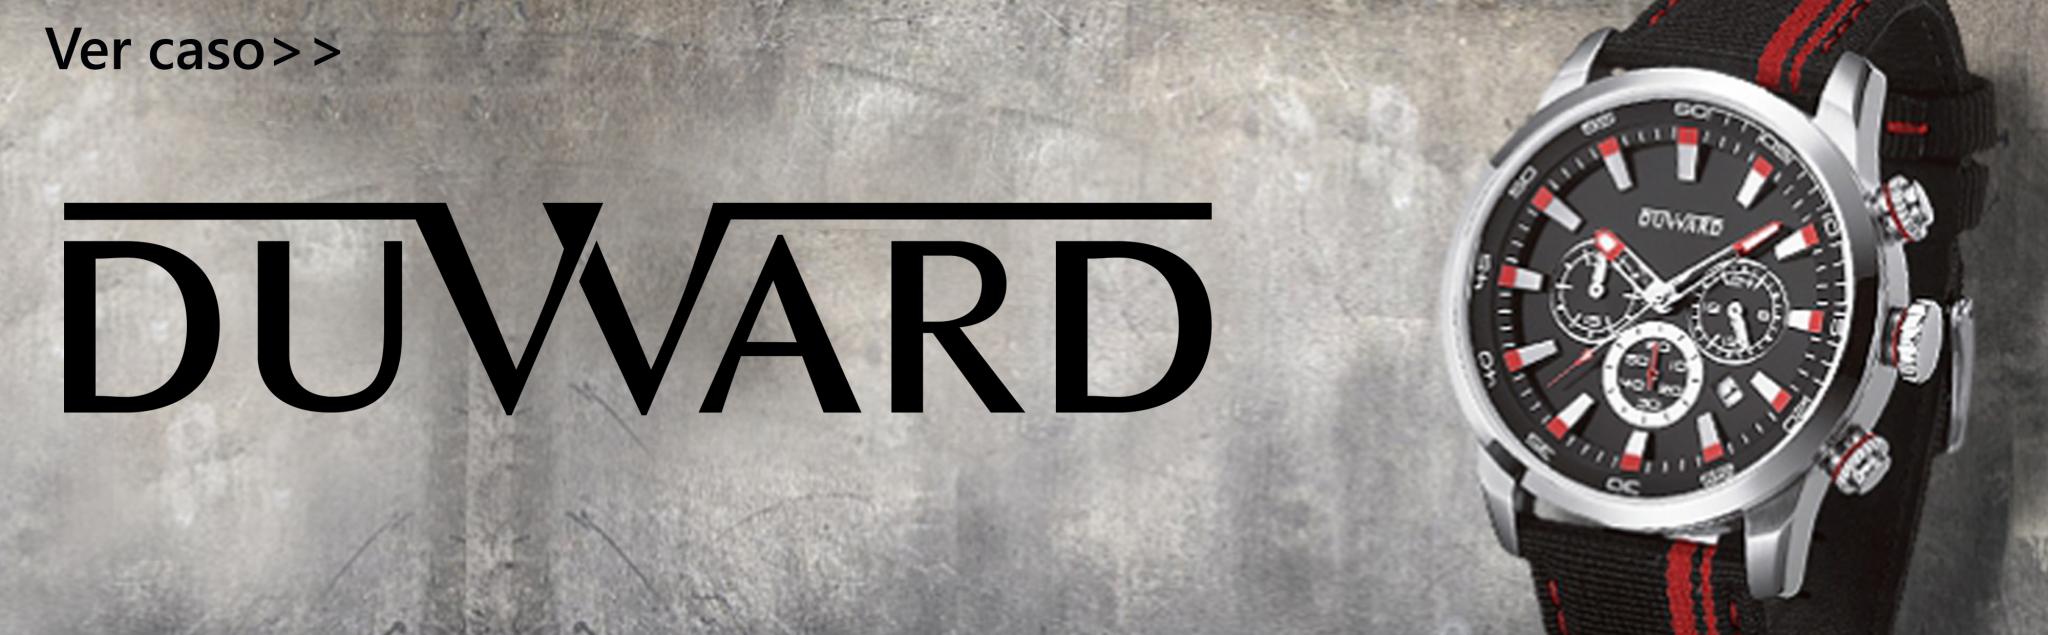 banners_duward_vc